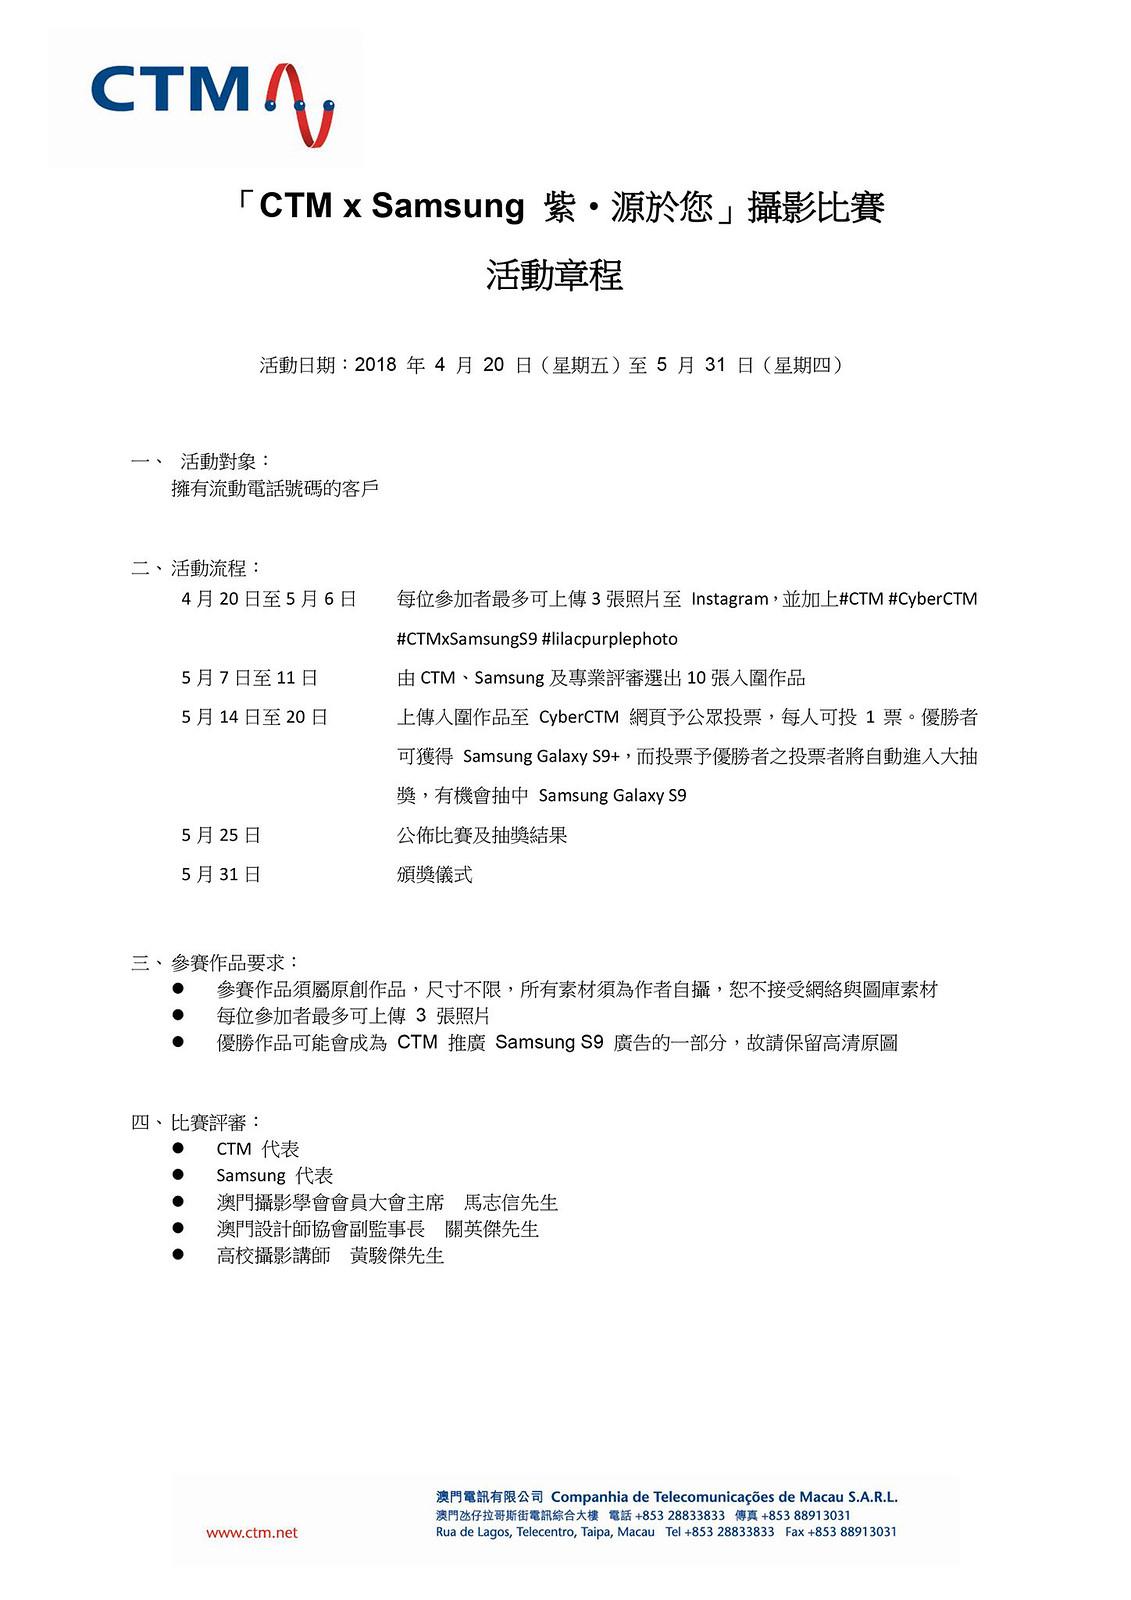 CTMxSamsung_20180409-1